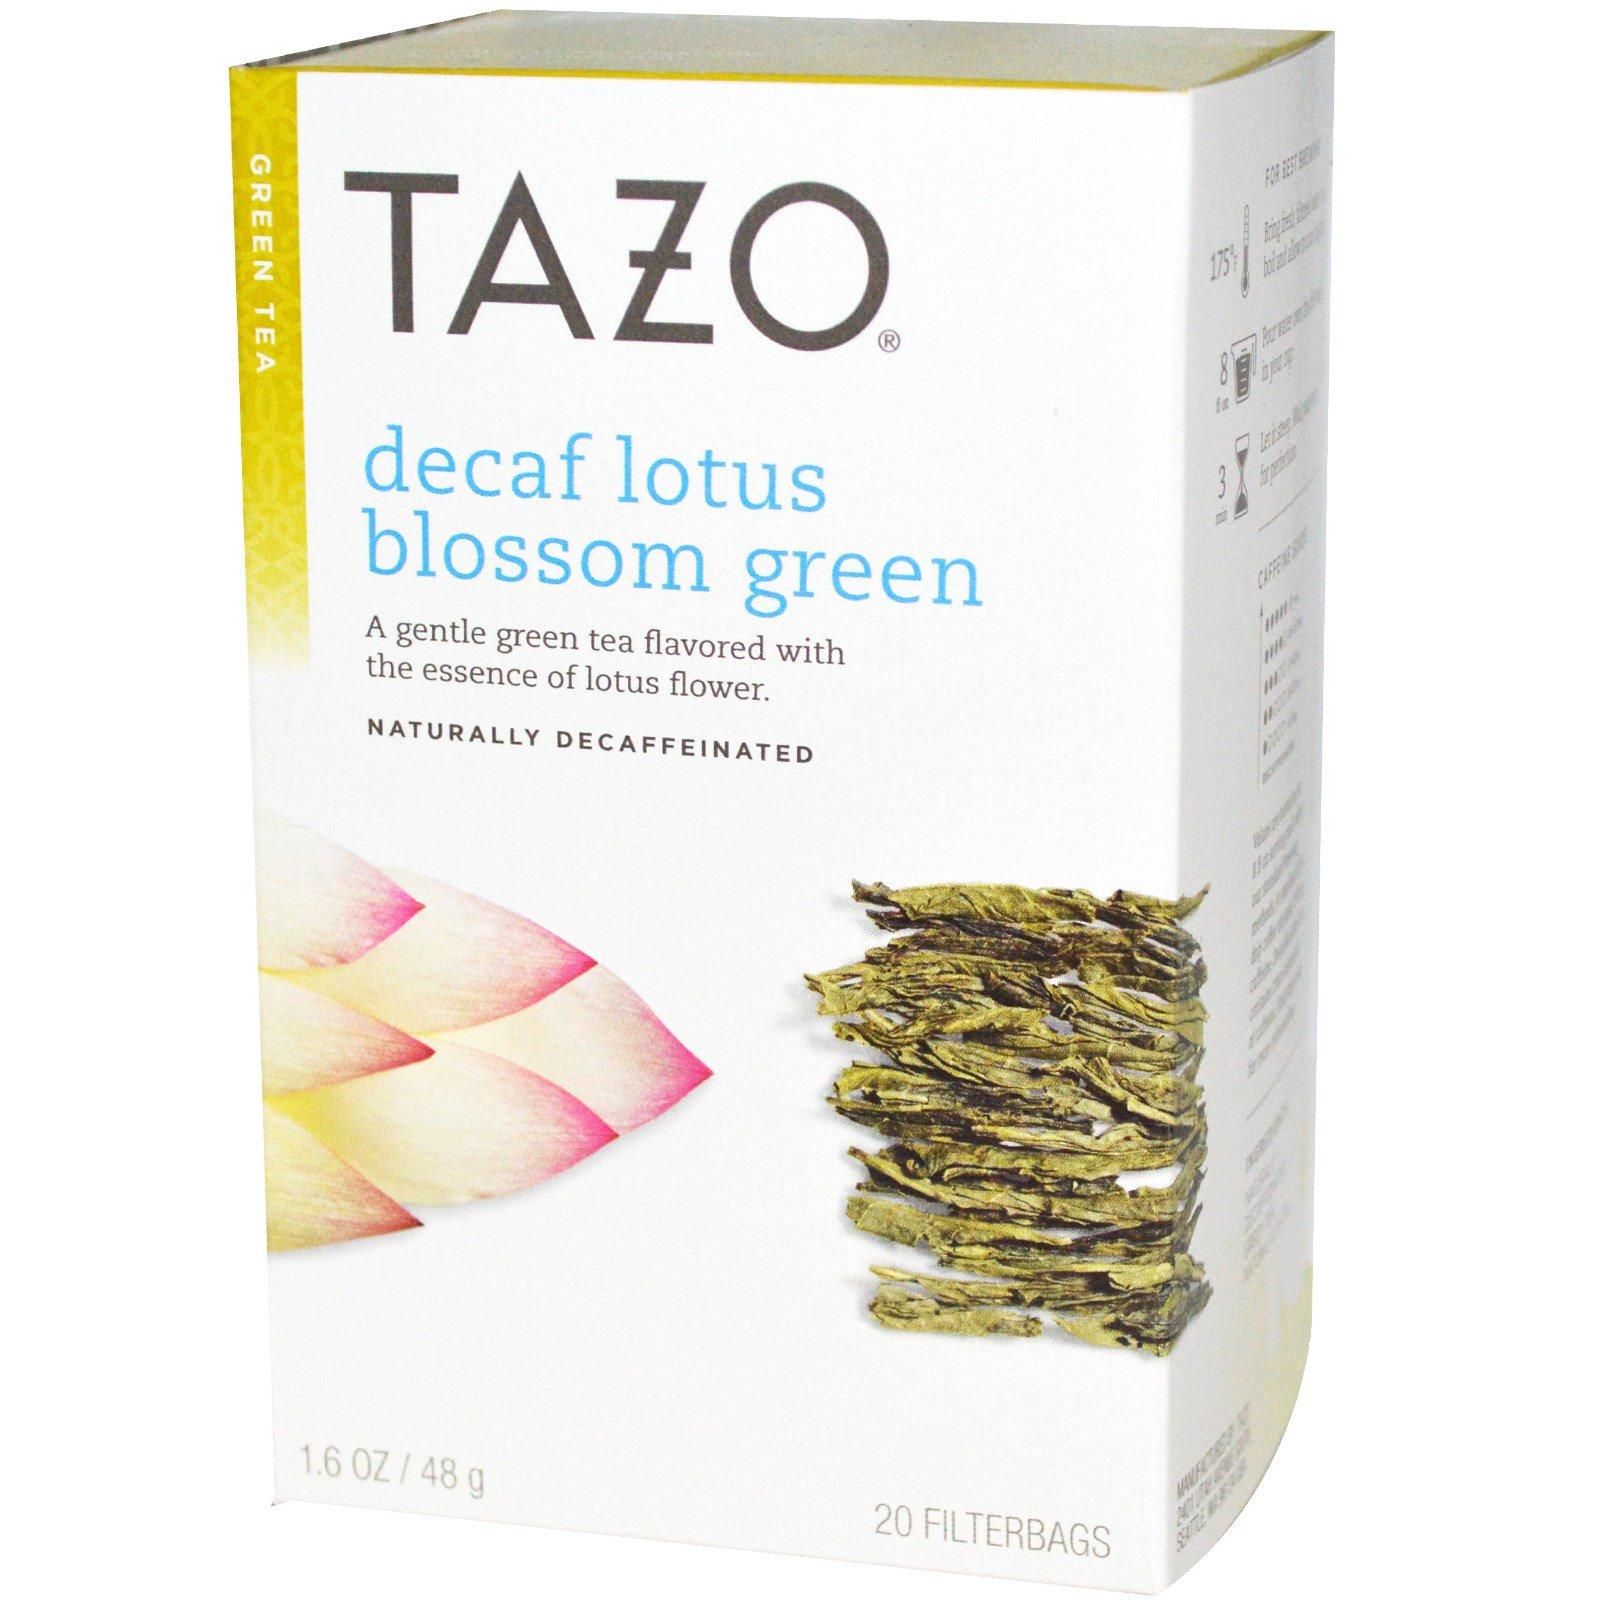 Tazo teas decaf lotus blossom green tea 20 filterbags 16 oz 48 tazo teas decaf lotus blossom green tea 20 filterbags 16 oz 48 izmirmasajfo Image collections